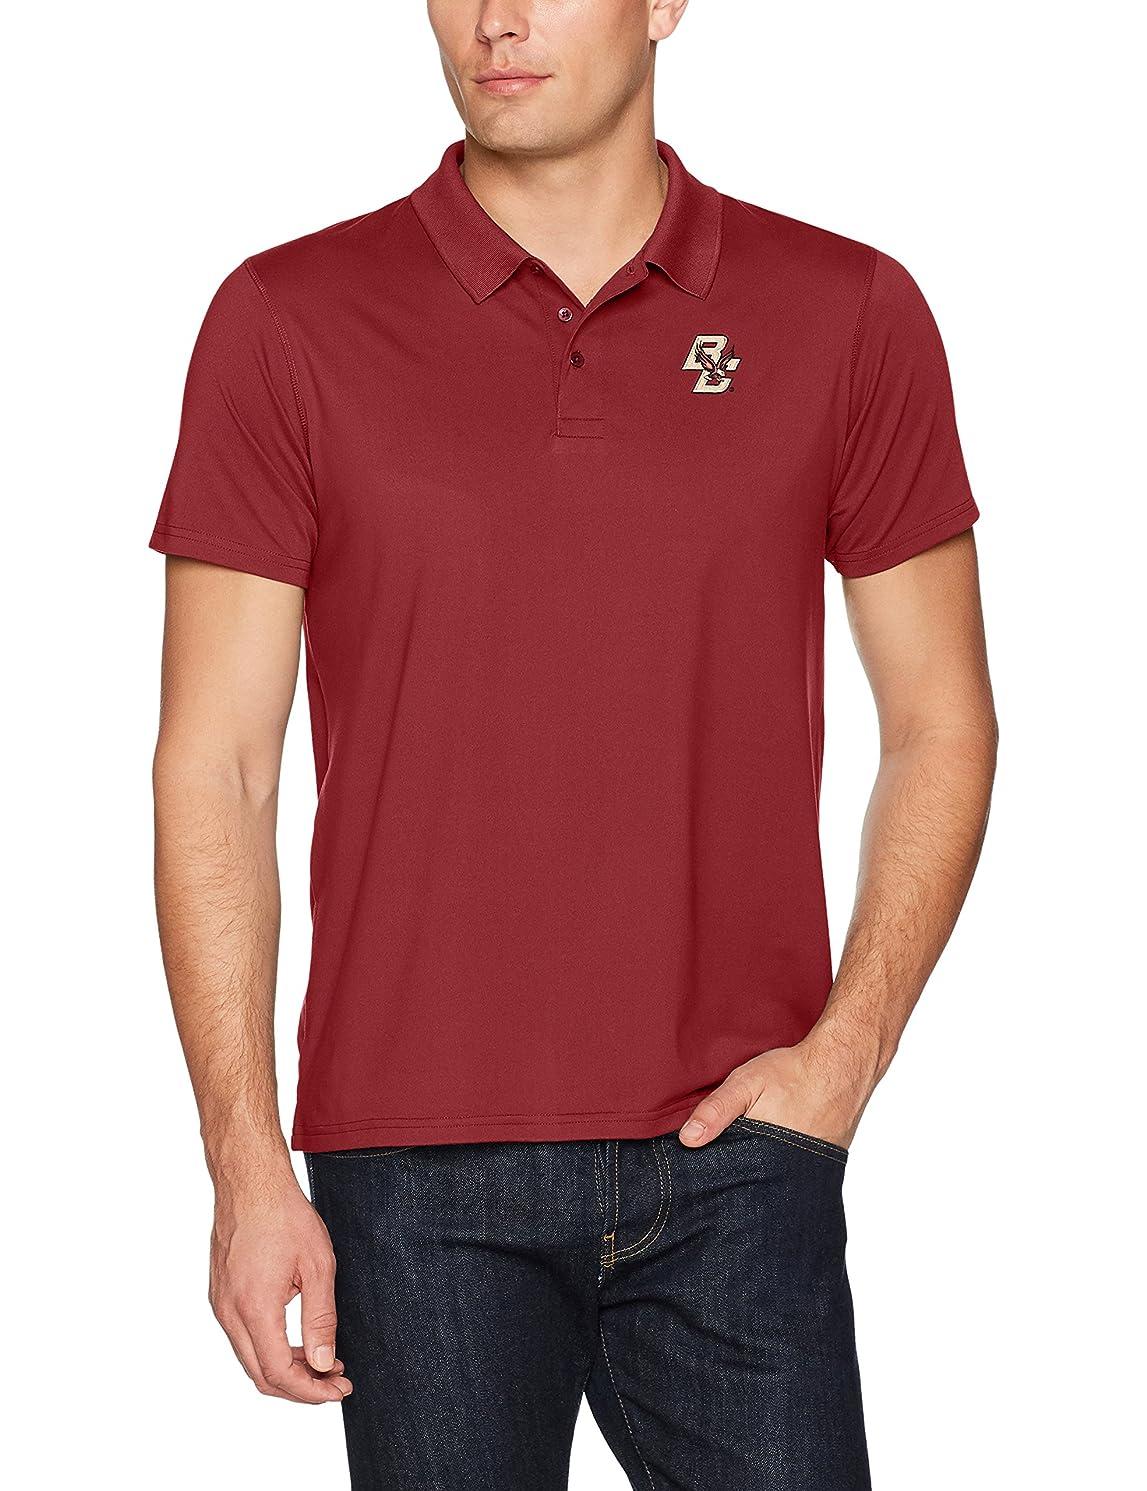 OTS NCAA Adult Men's NCAA Men's Sueded Short Sleeve Polo Shirt